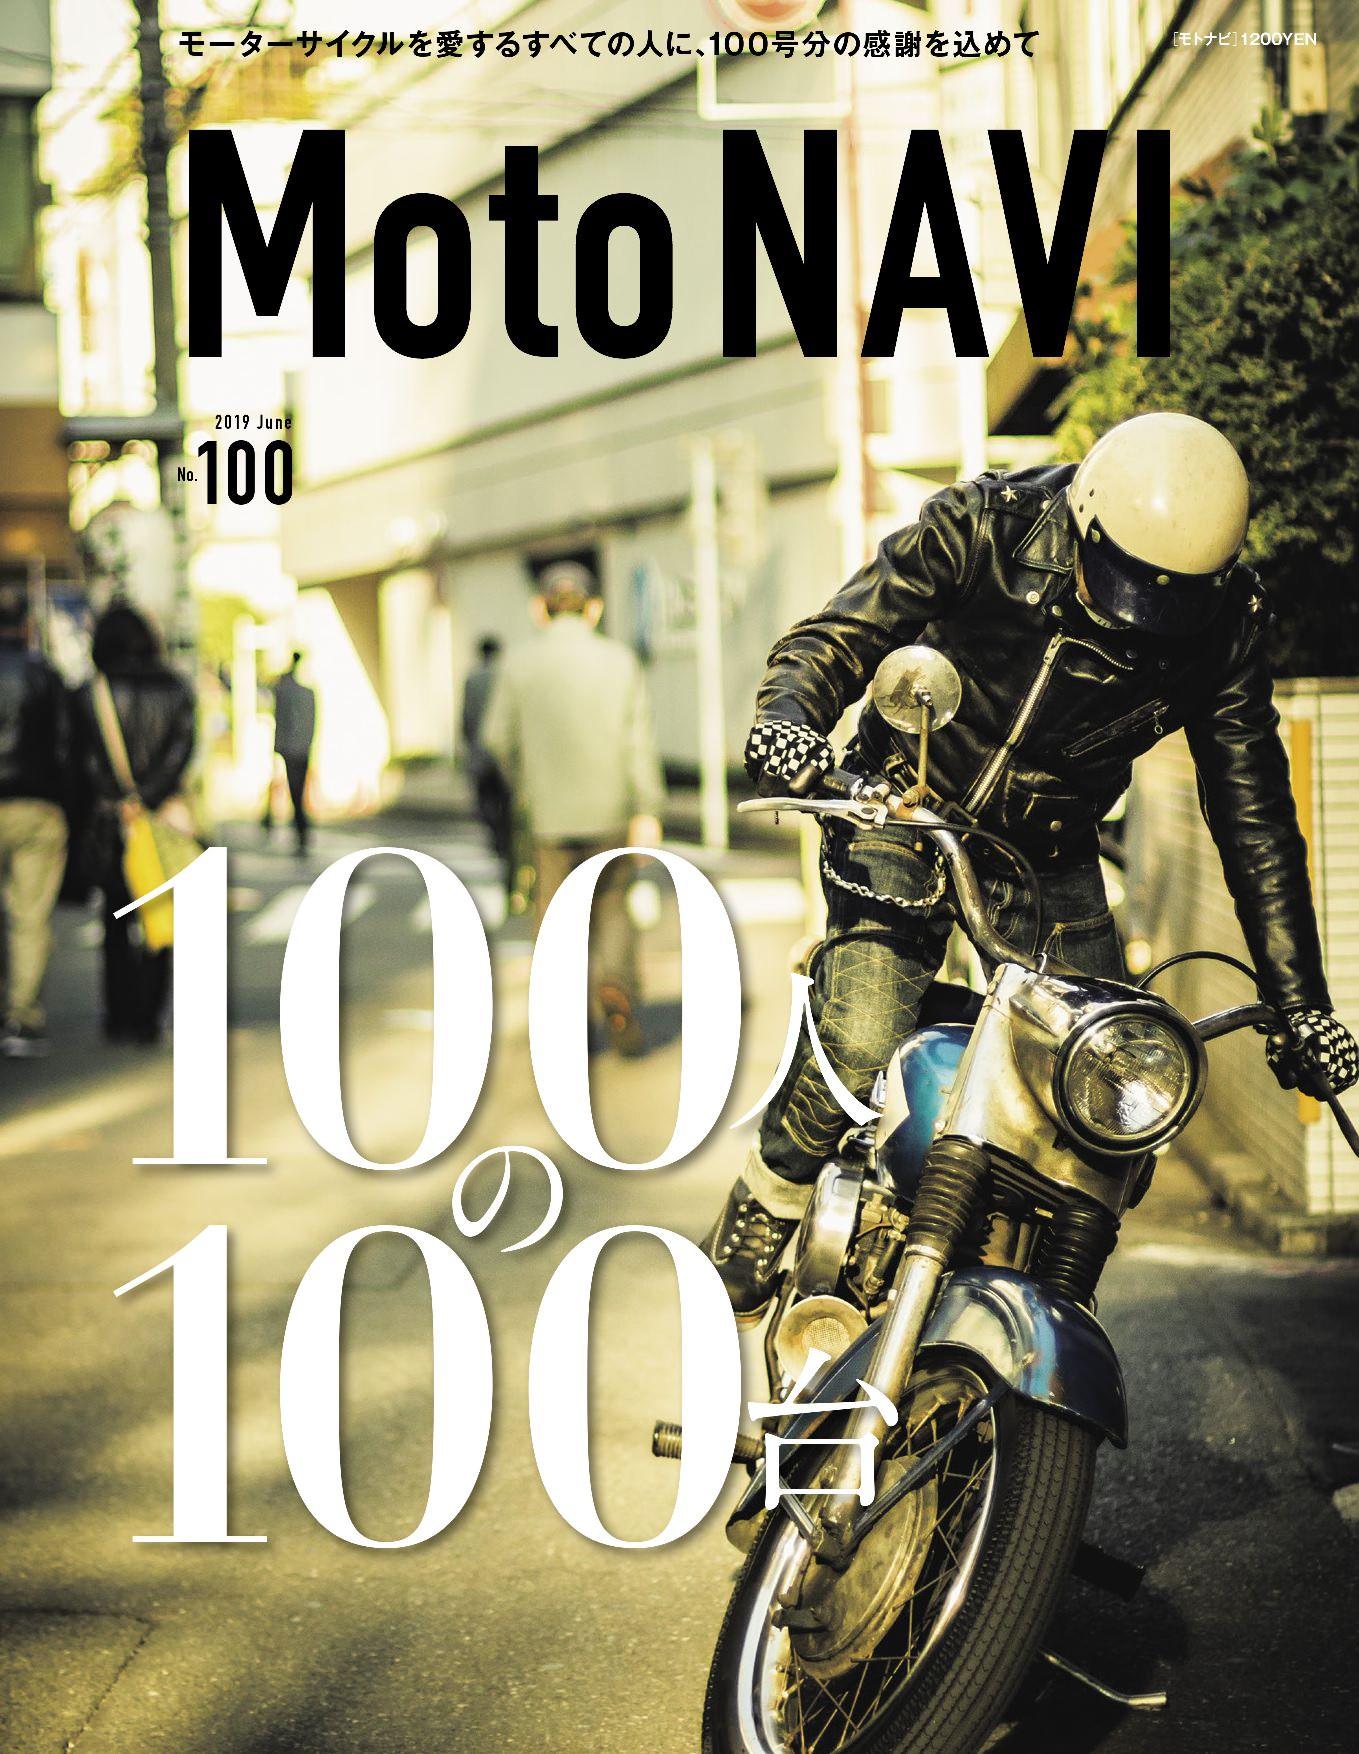 「Moto NAVI」 6月号にてHOMAが紹介されました。